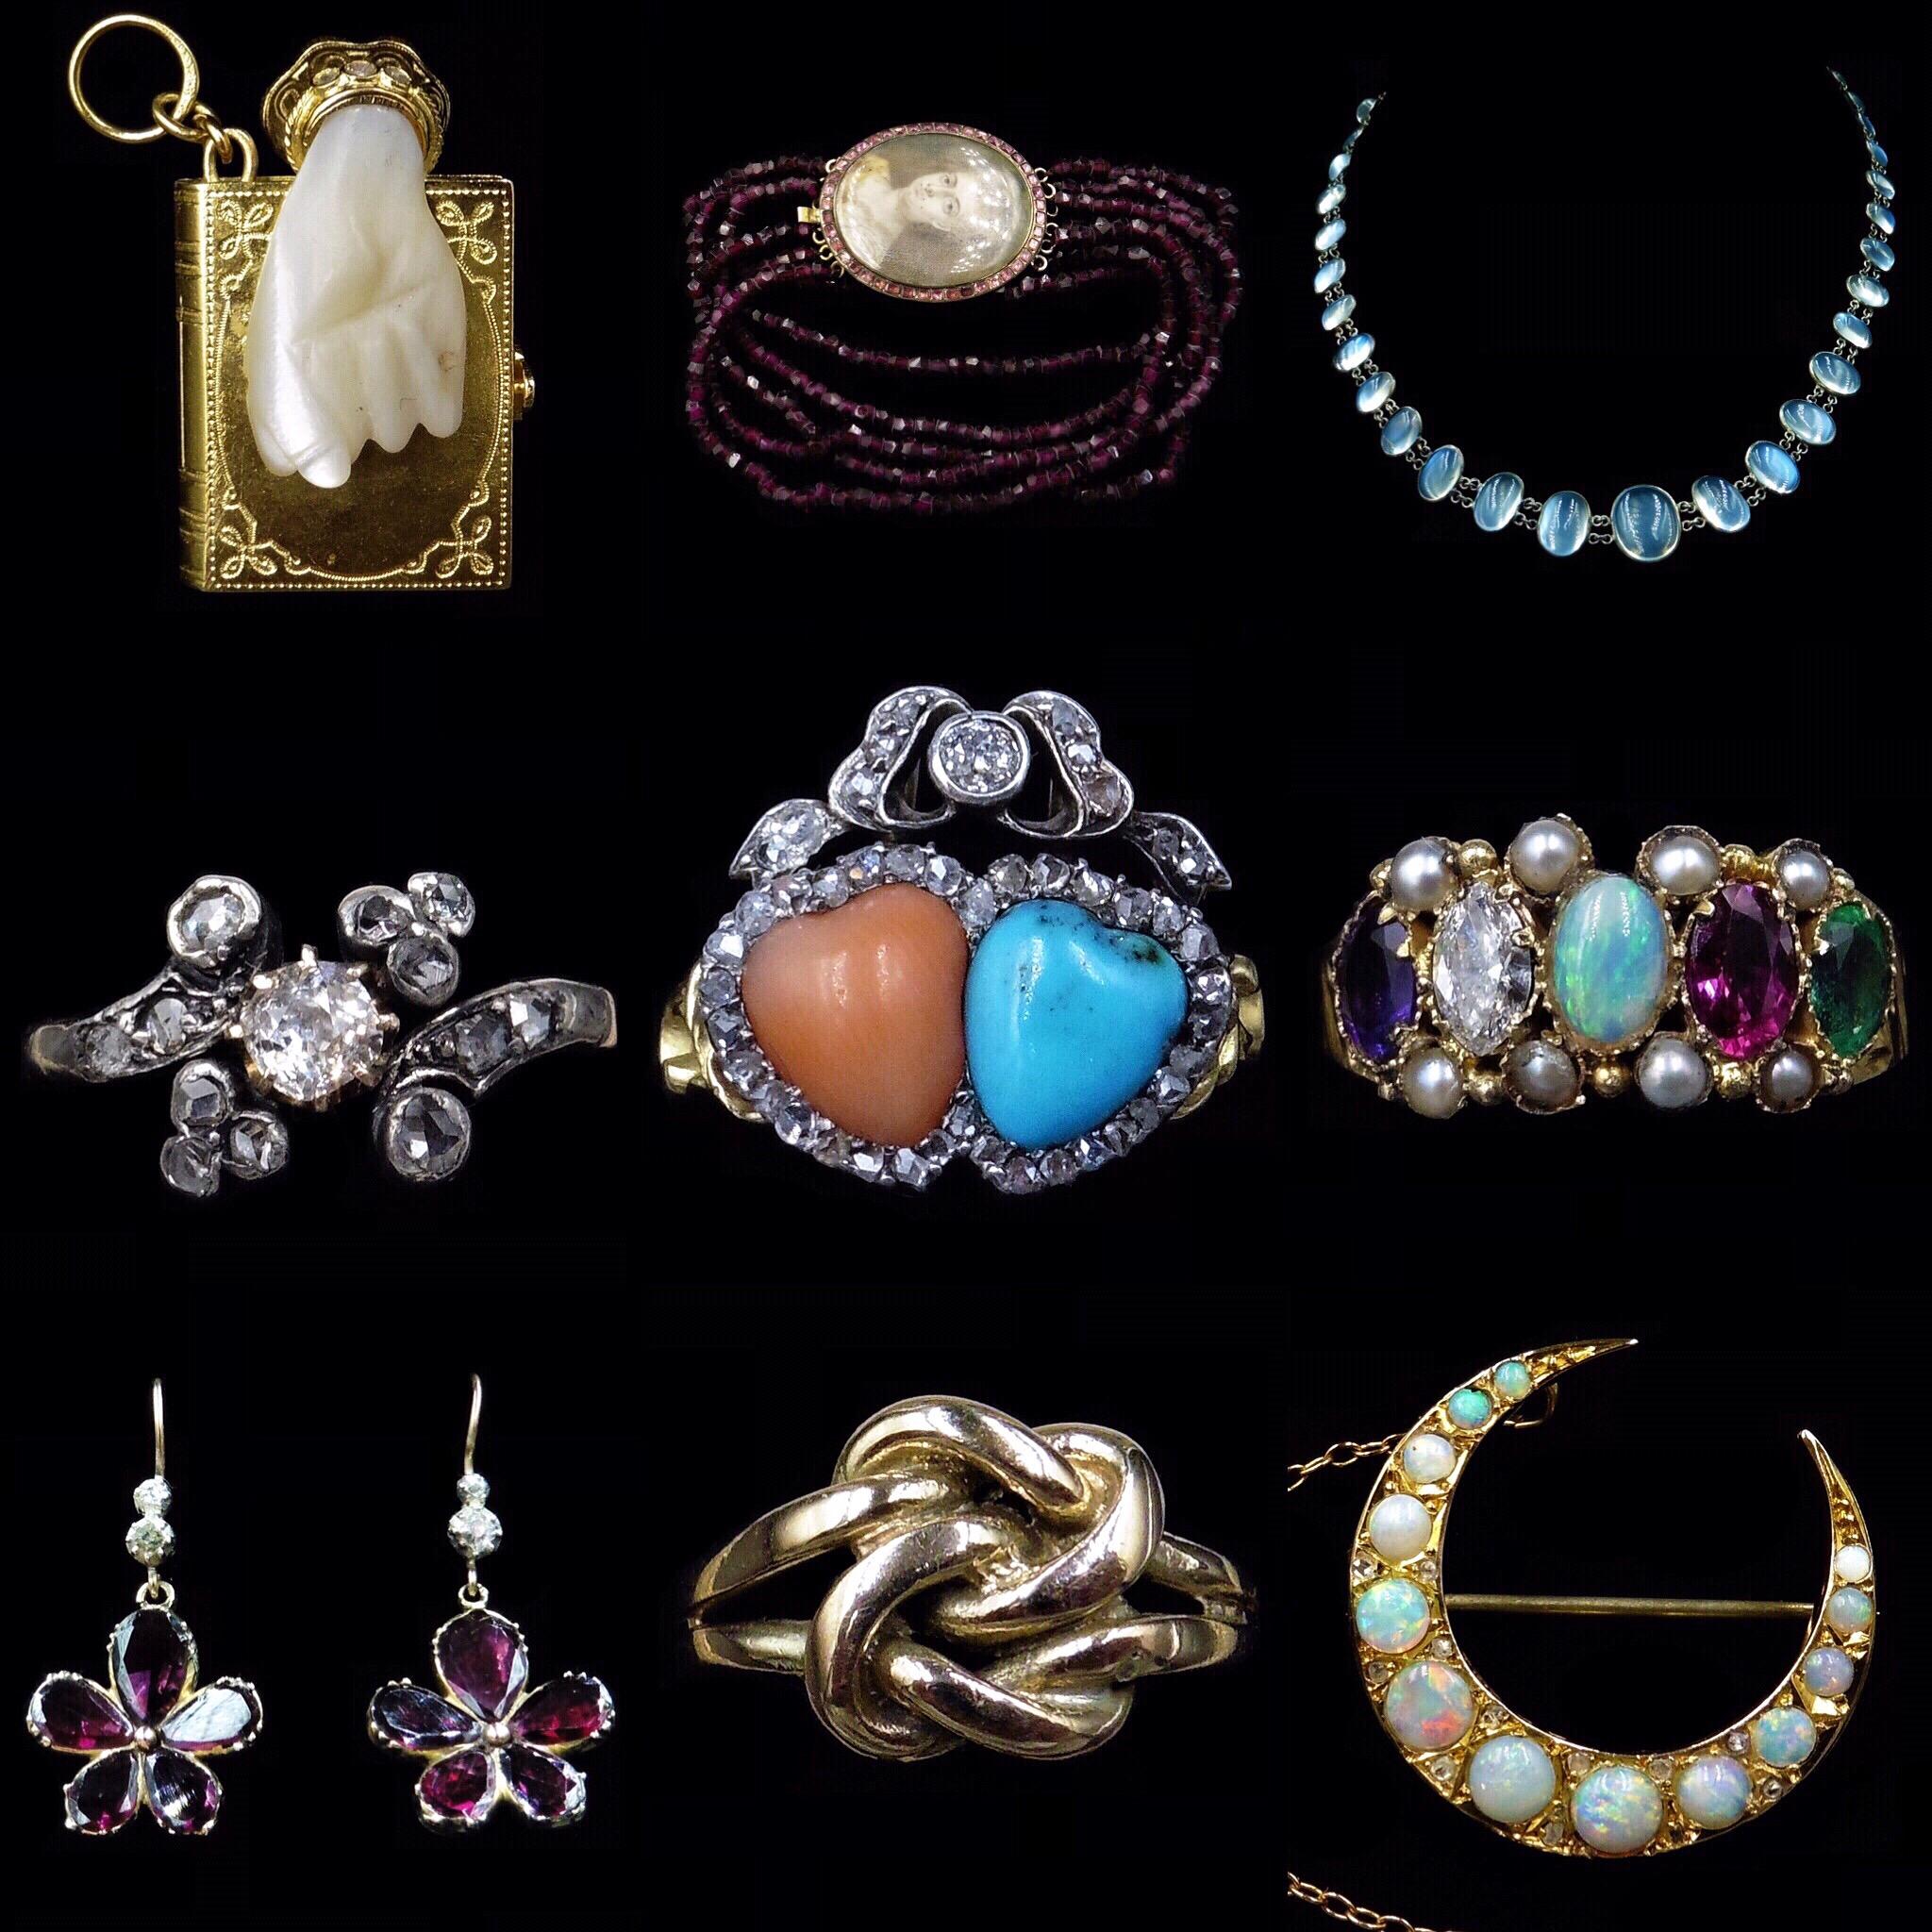 Lancastrian Jewellers image (2 of 6)